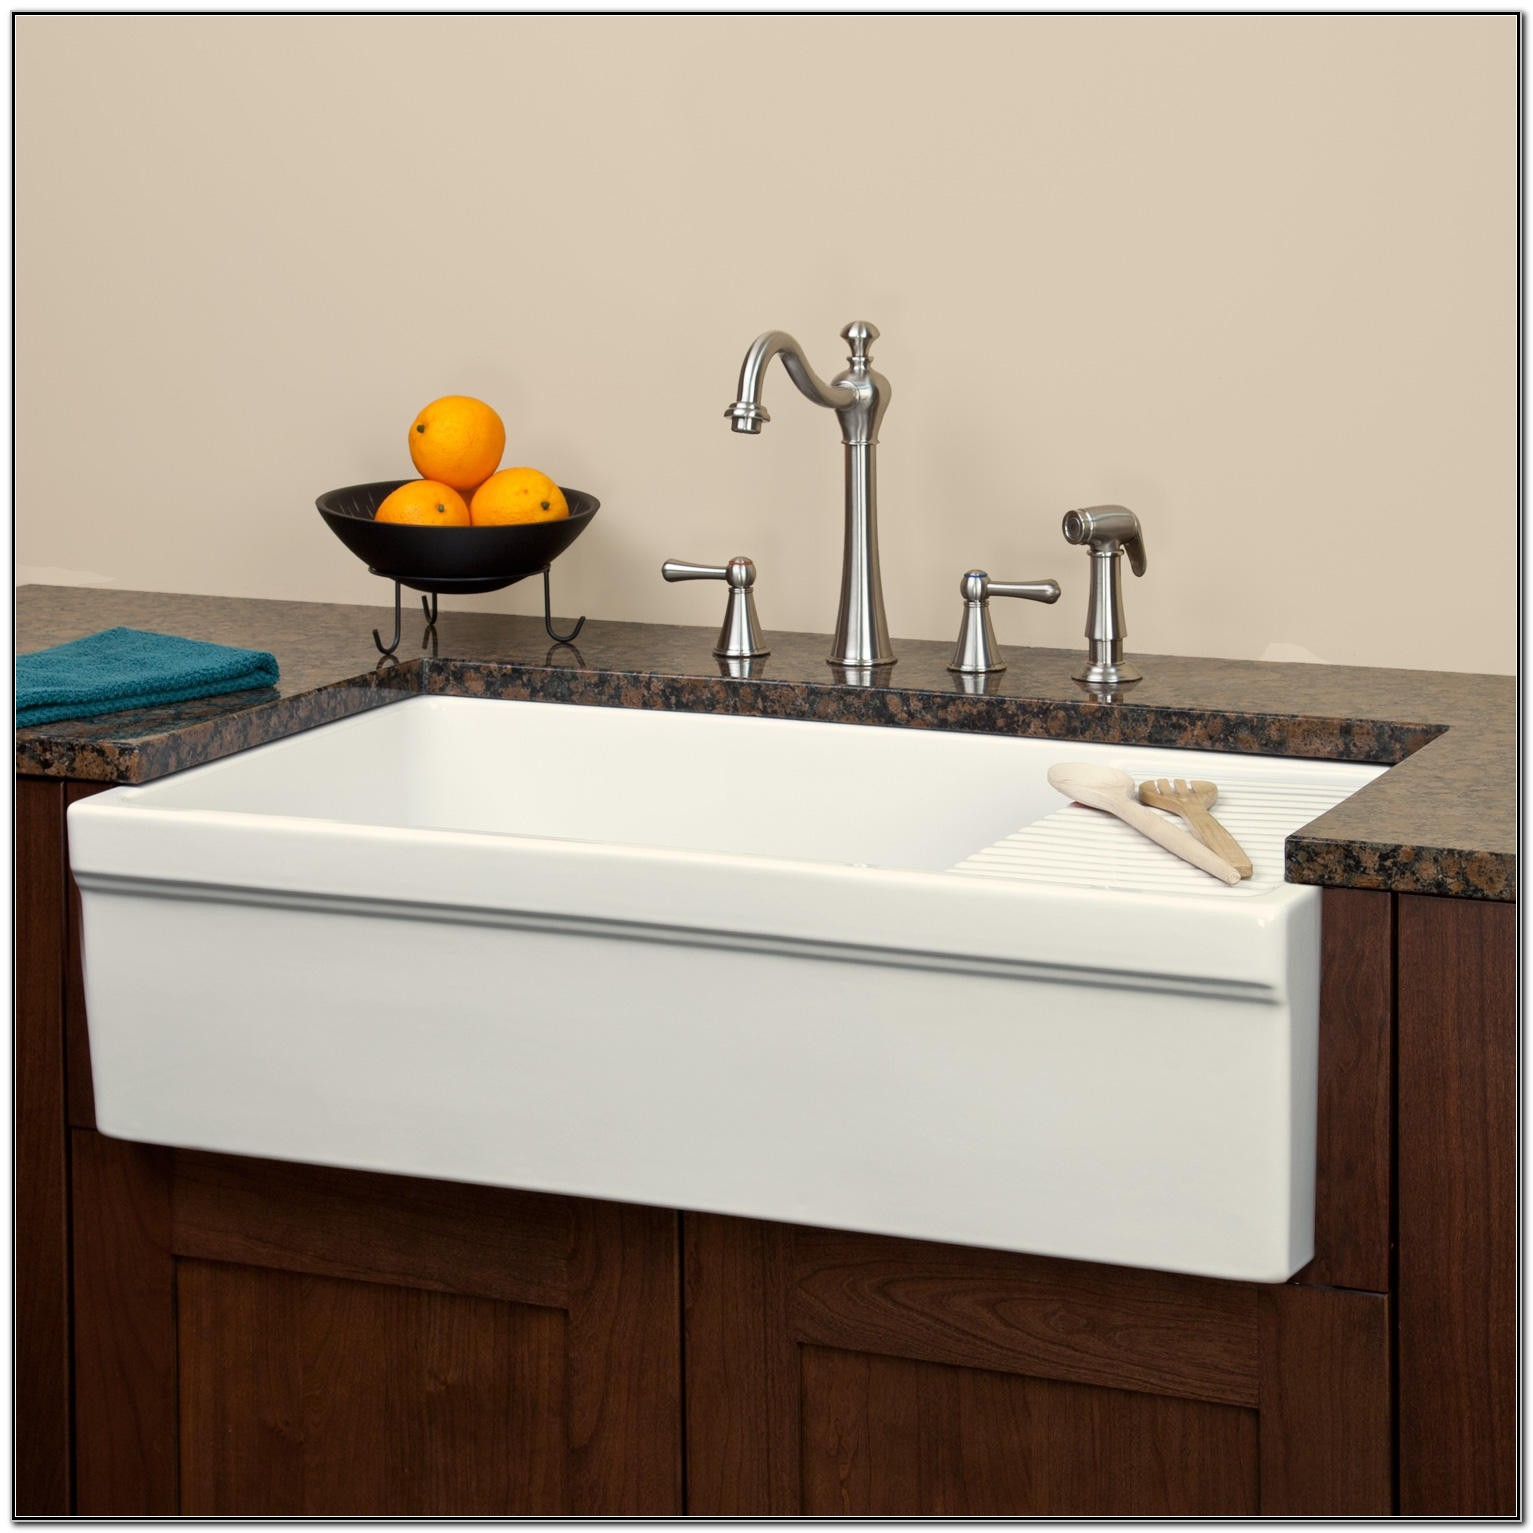 36 White Fireclay Farmhouse Sink